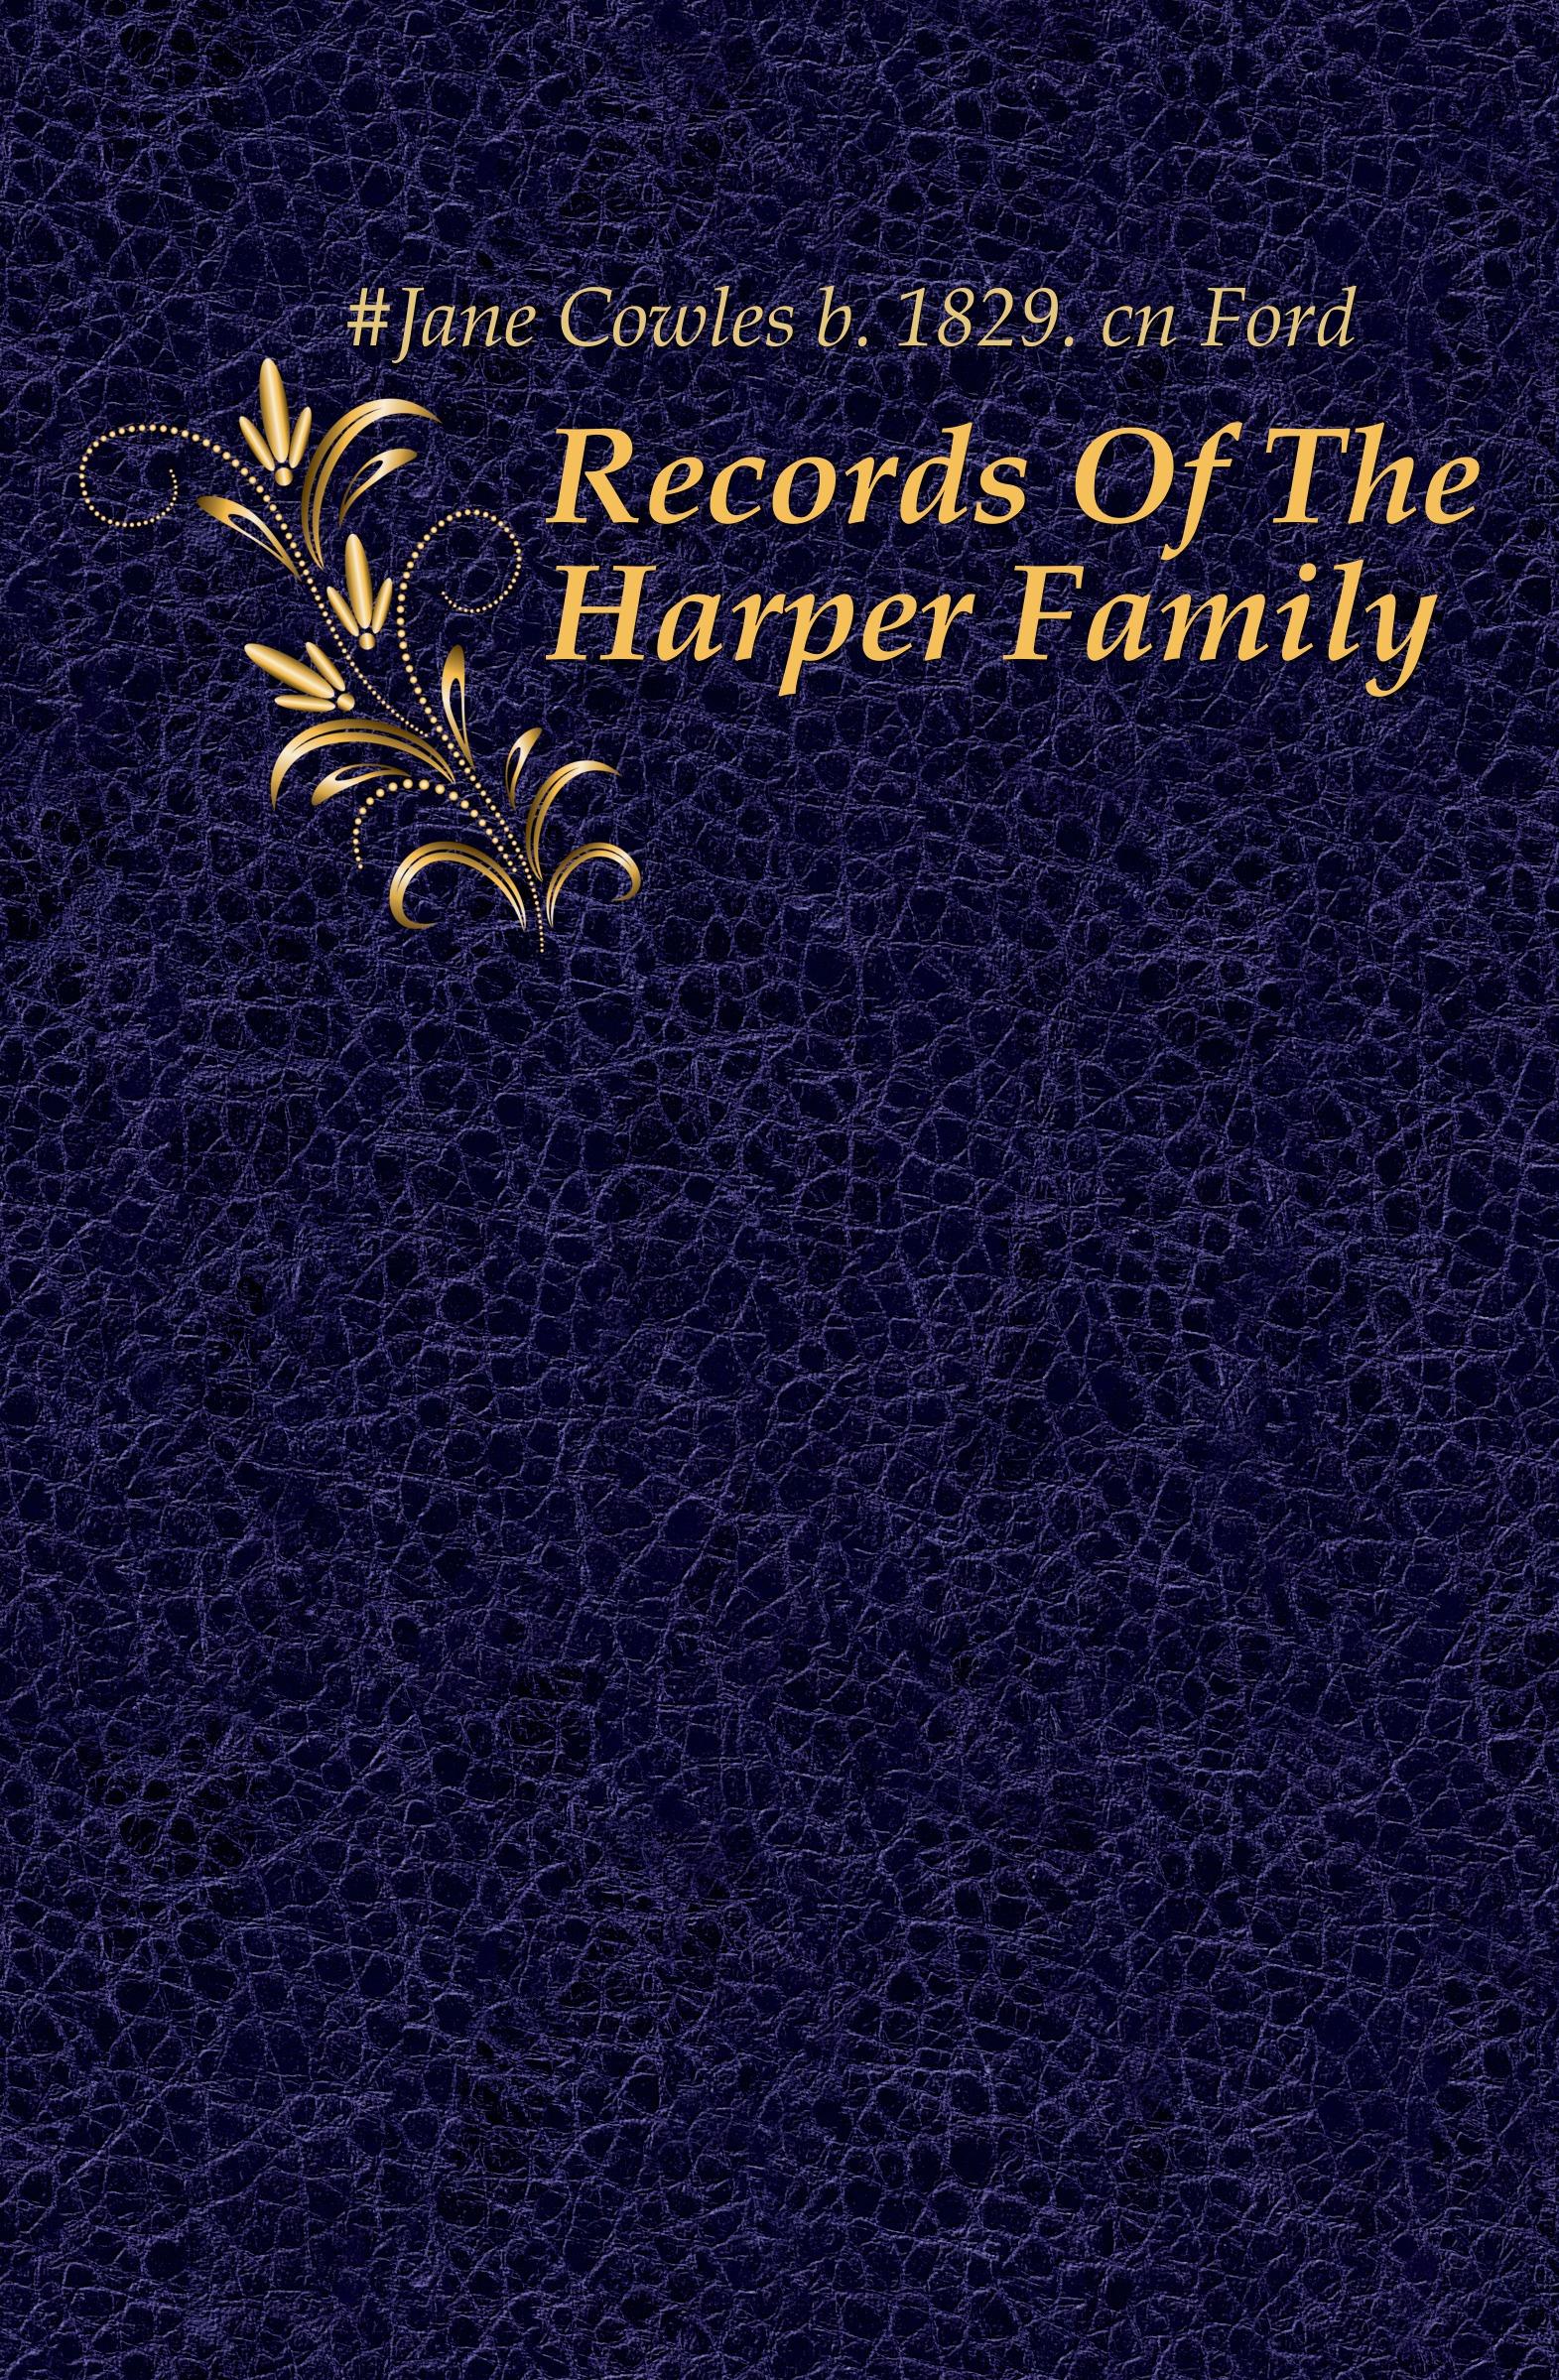 лучшая цена Jane Cowles Records Of The Harper Family